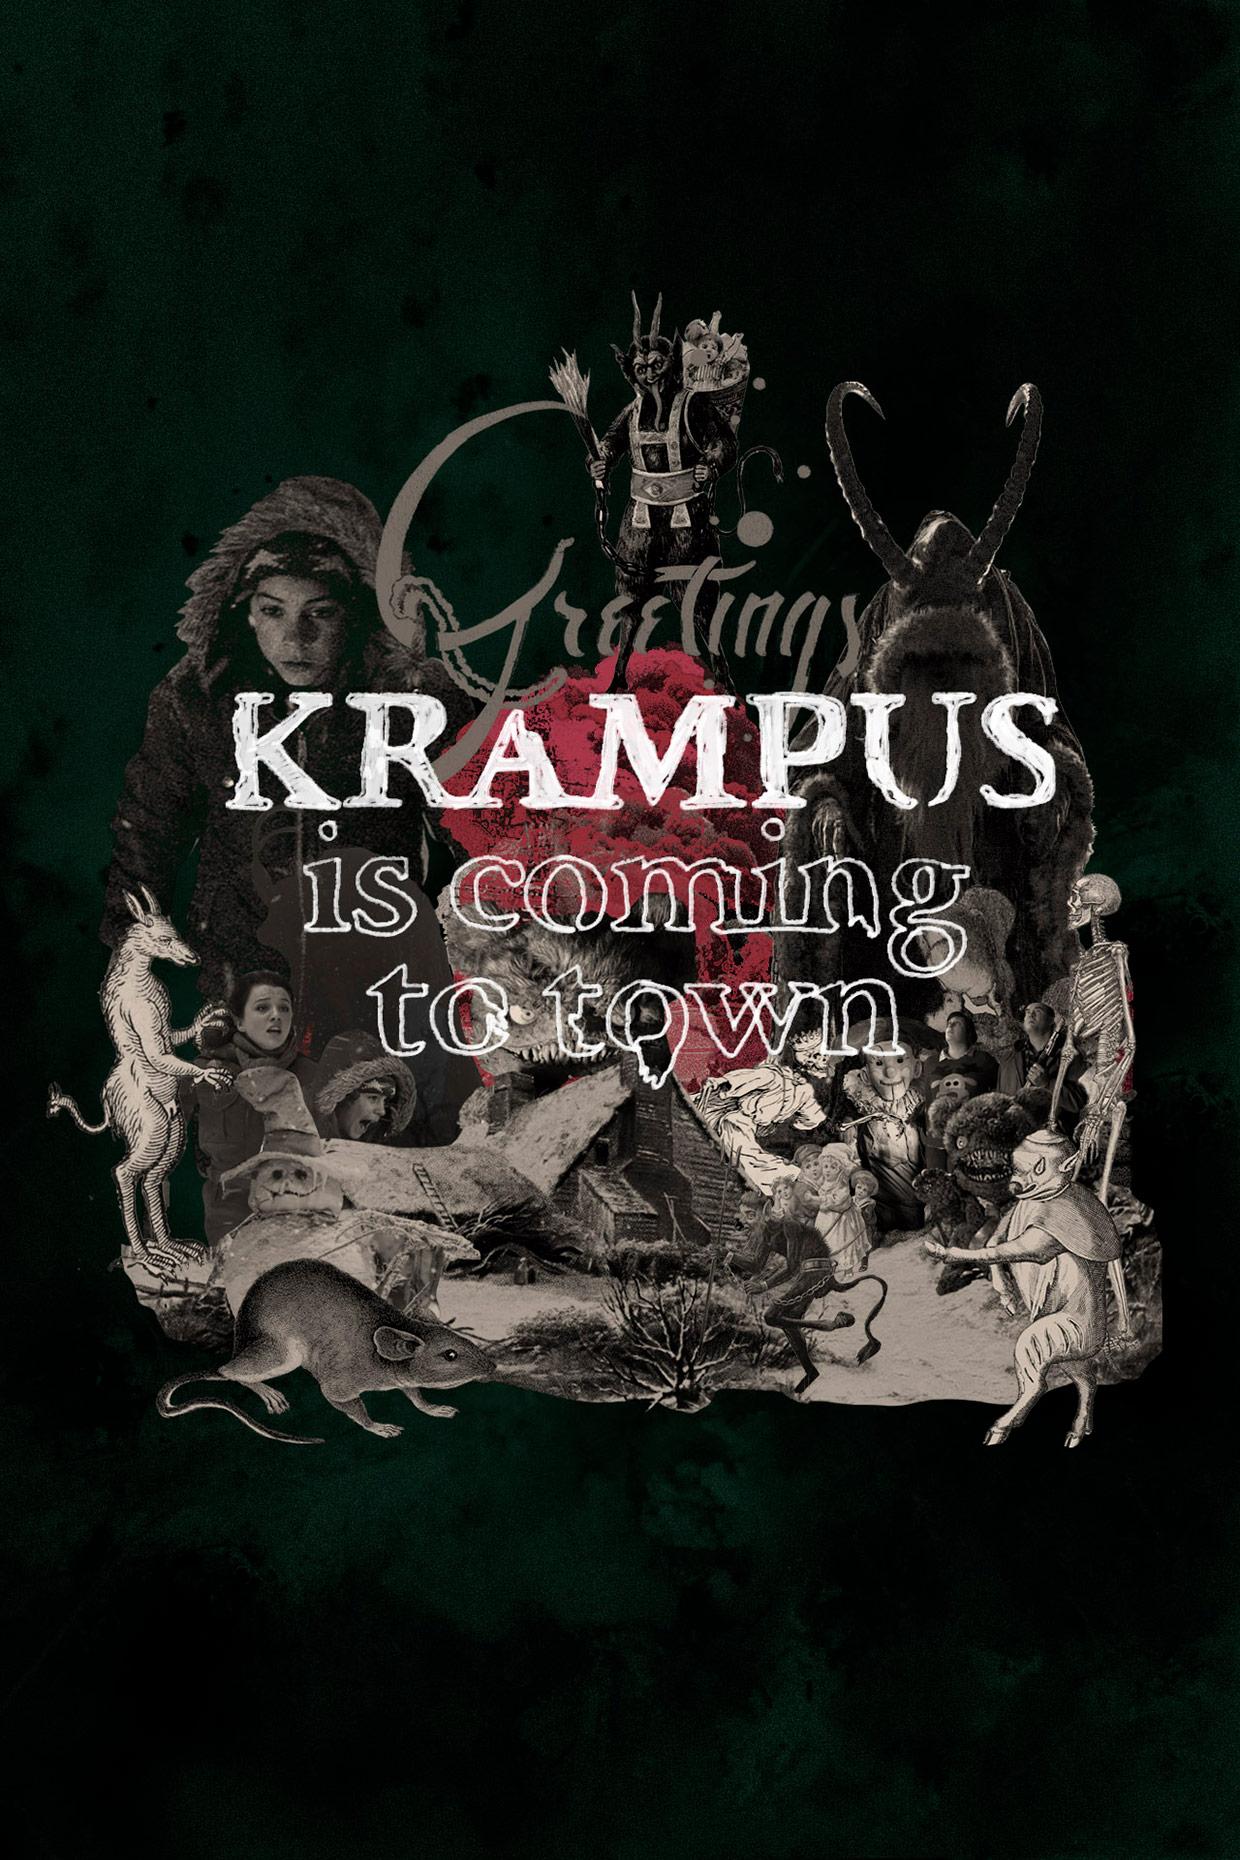 Maxomatic-Krampus-5.jpg